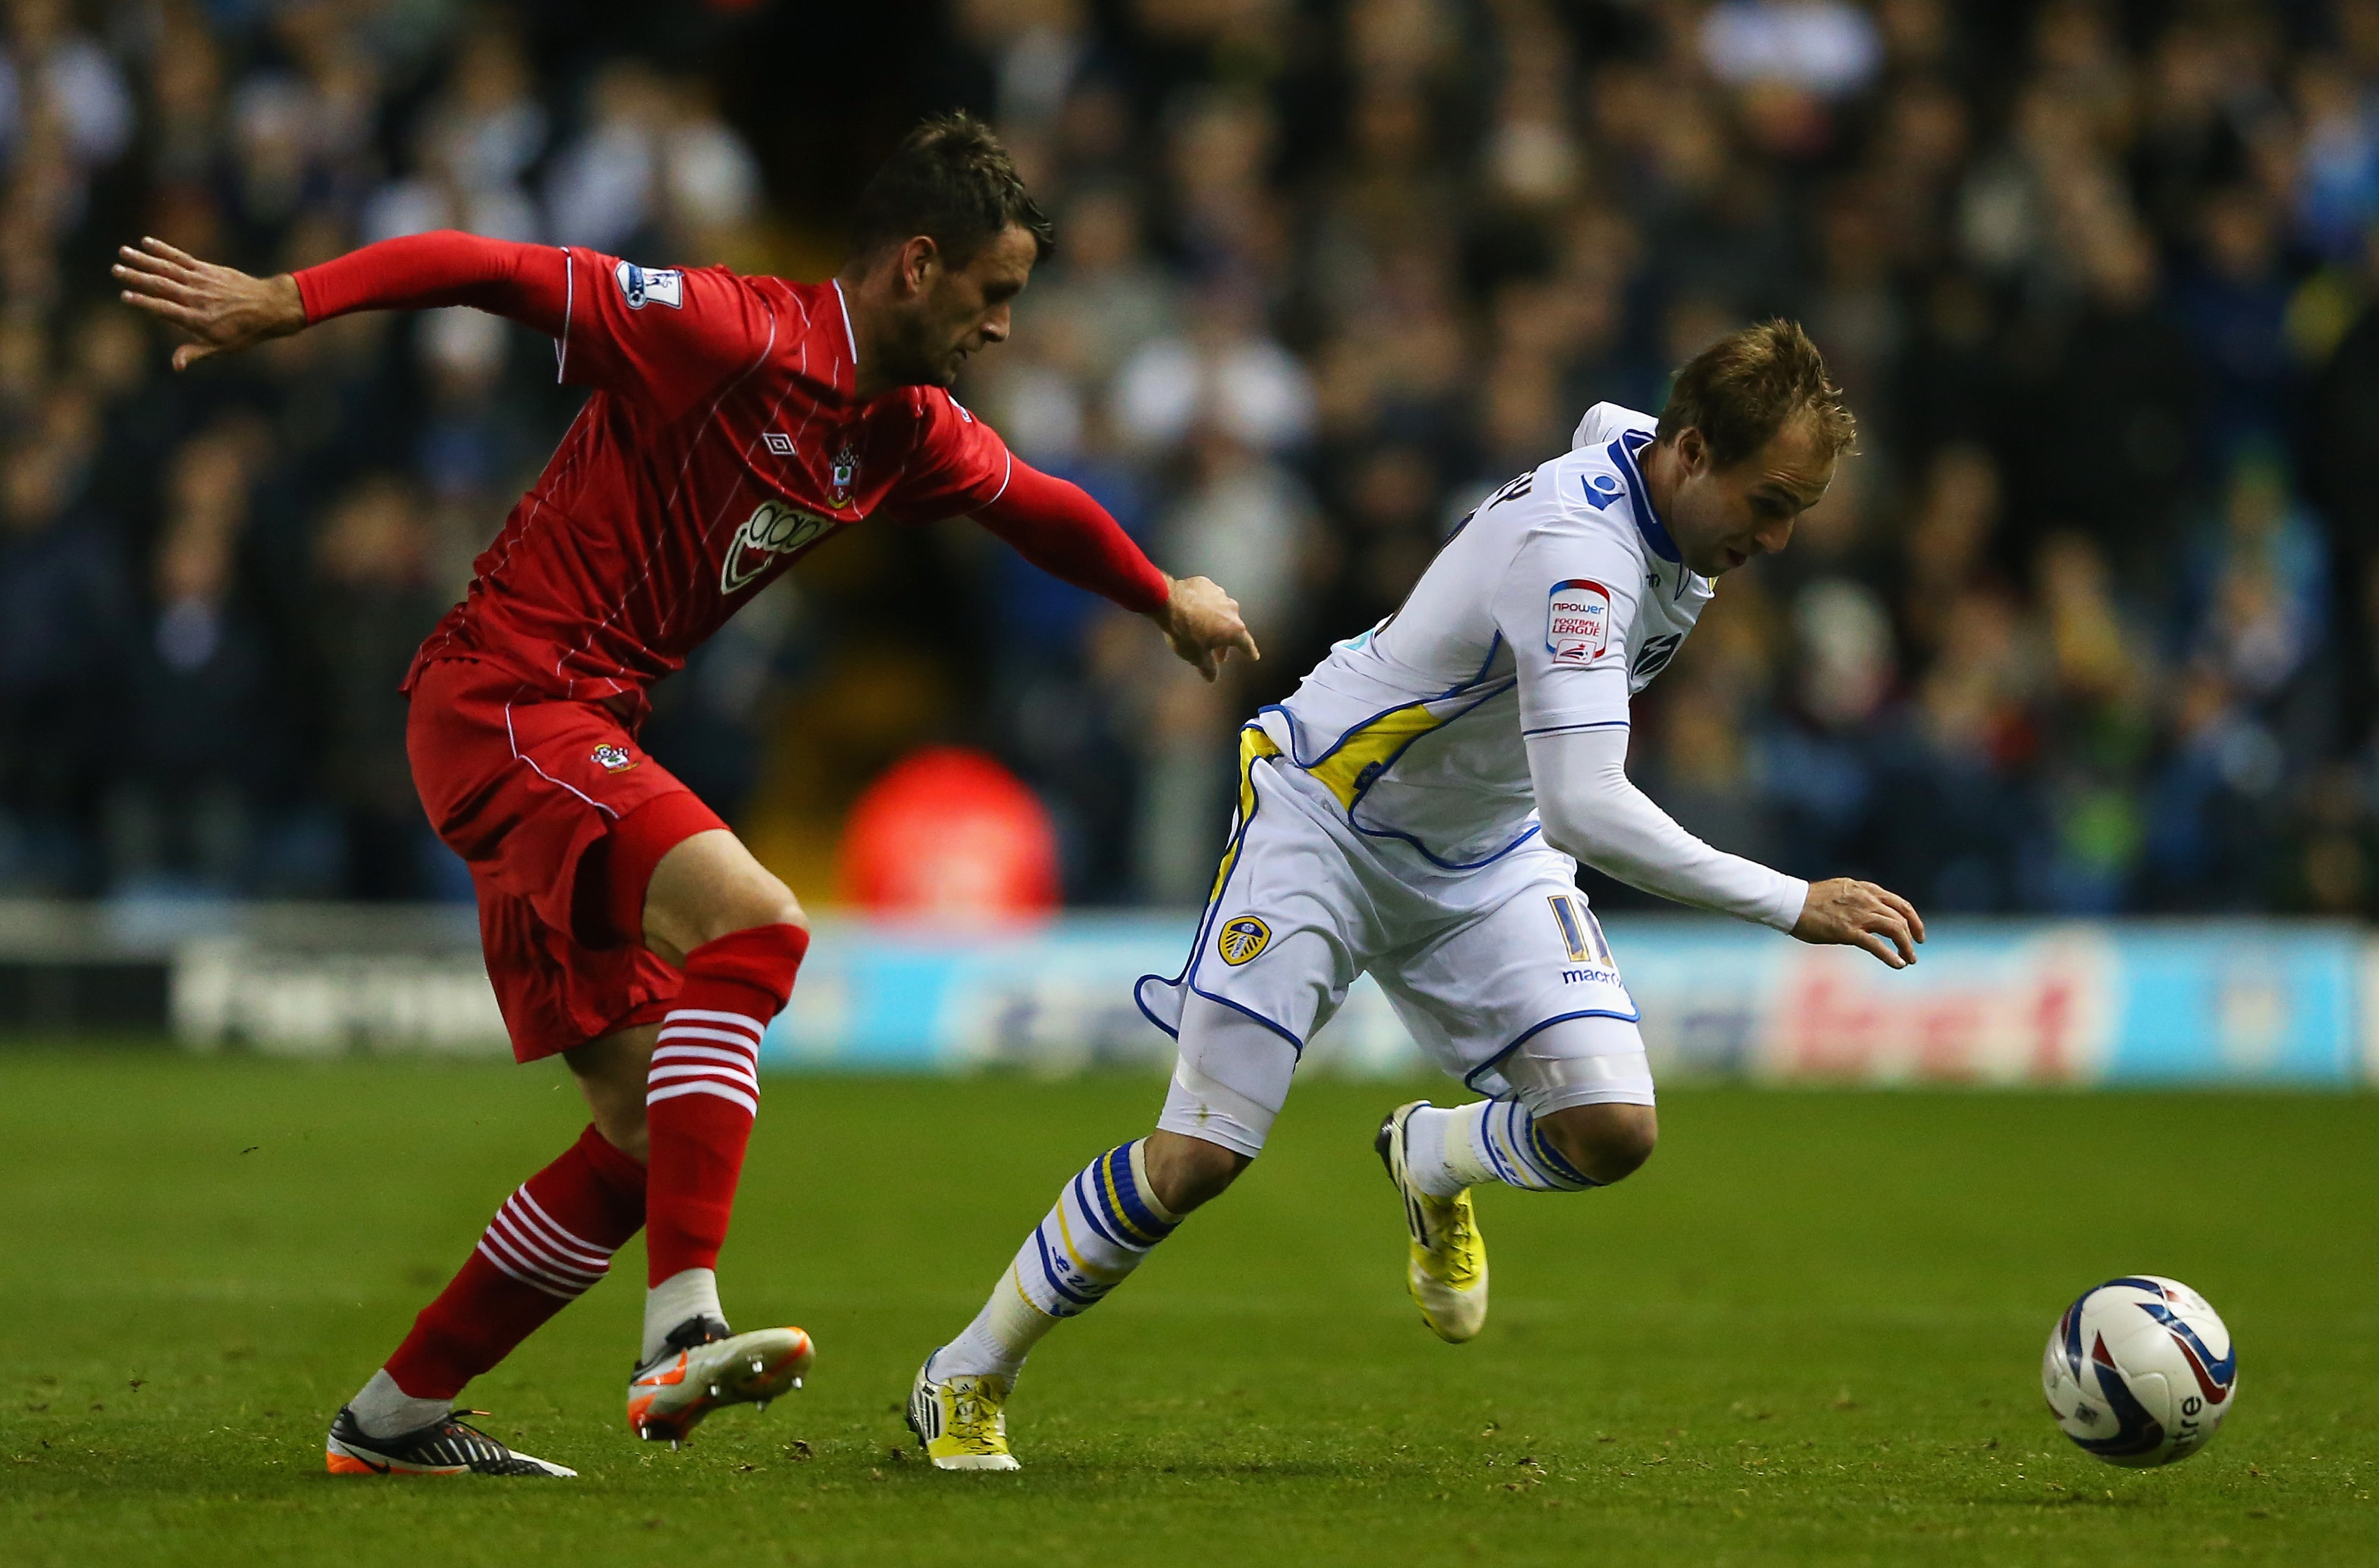 Luke Varney won a first half penalty.